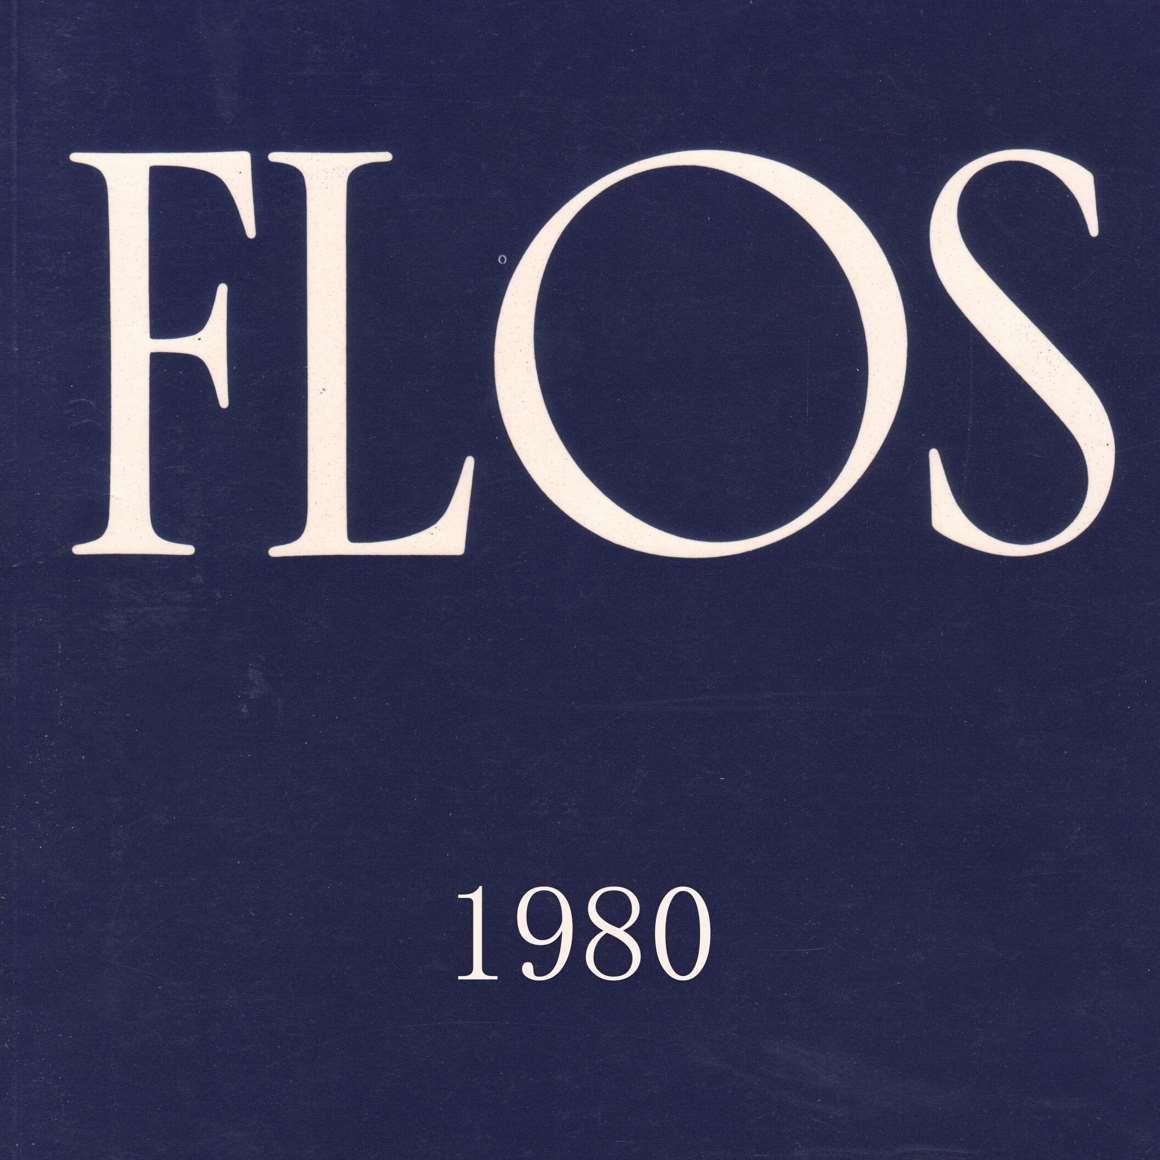 Vintage Lighting Catalogues - Flos Catalogue 1980